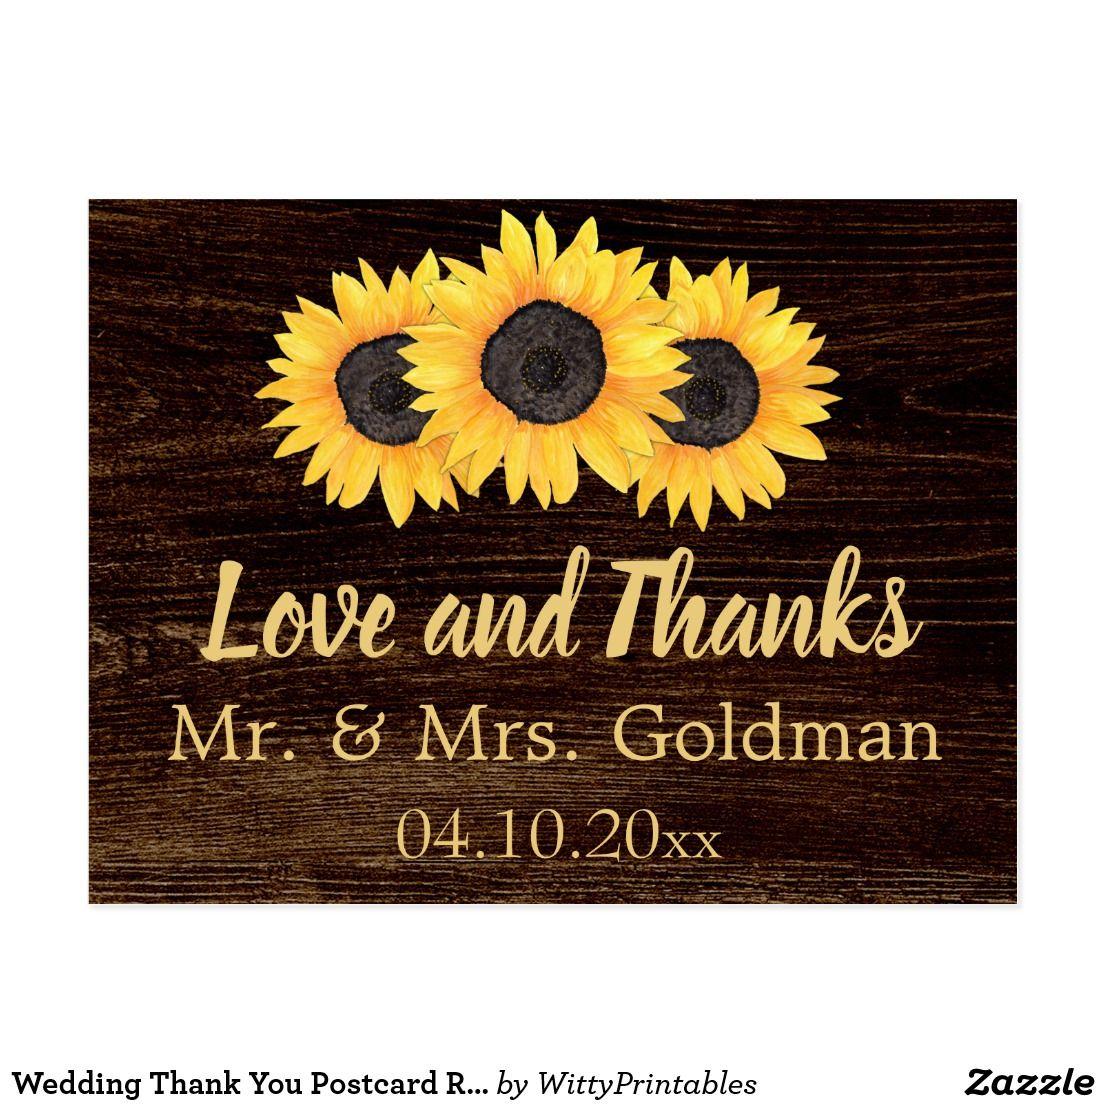 tulip wedding invitation templates%0A Wedding Thank You Postcard Rustic Sunflowers Wood